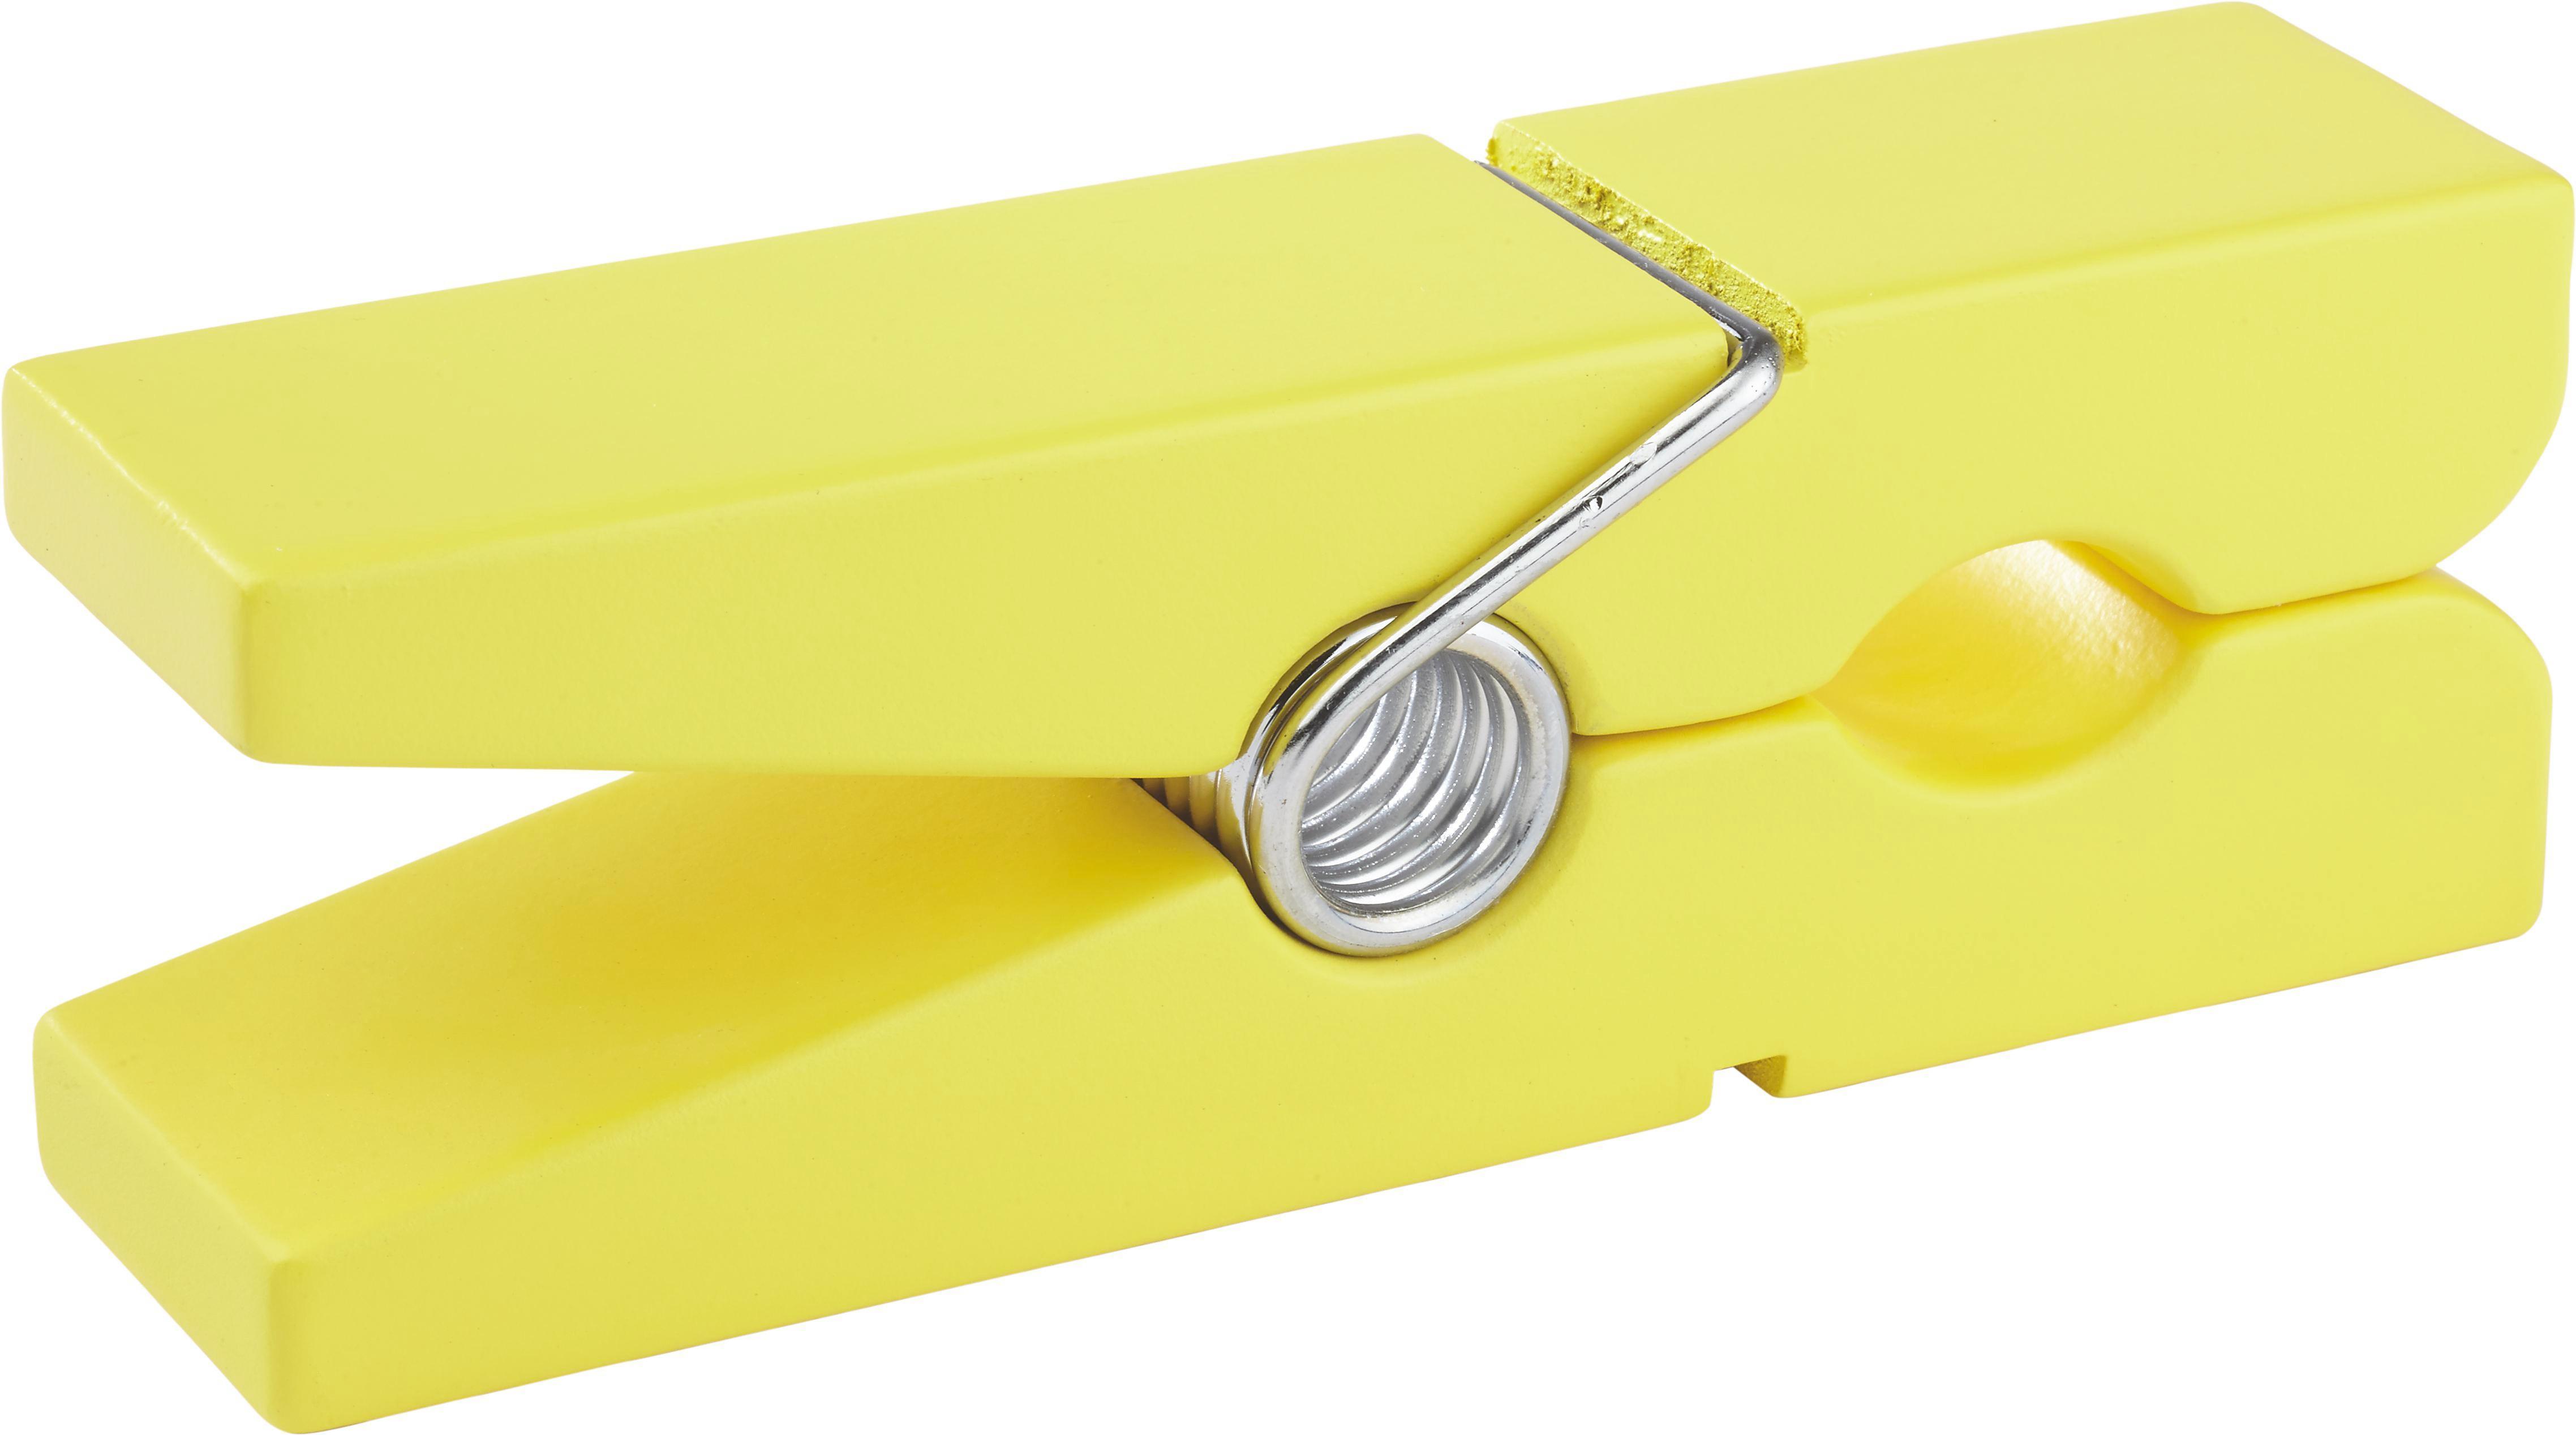 Wandhalter Gams in Gelb aus Holz - Gelb, Holz (20/5/7,5cm) - MÖMAX modern living